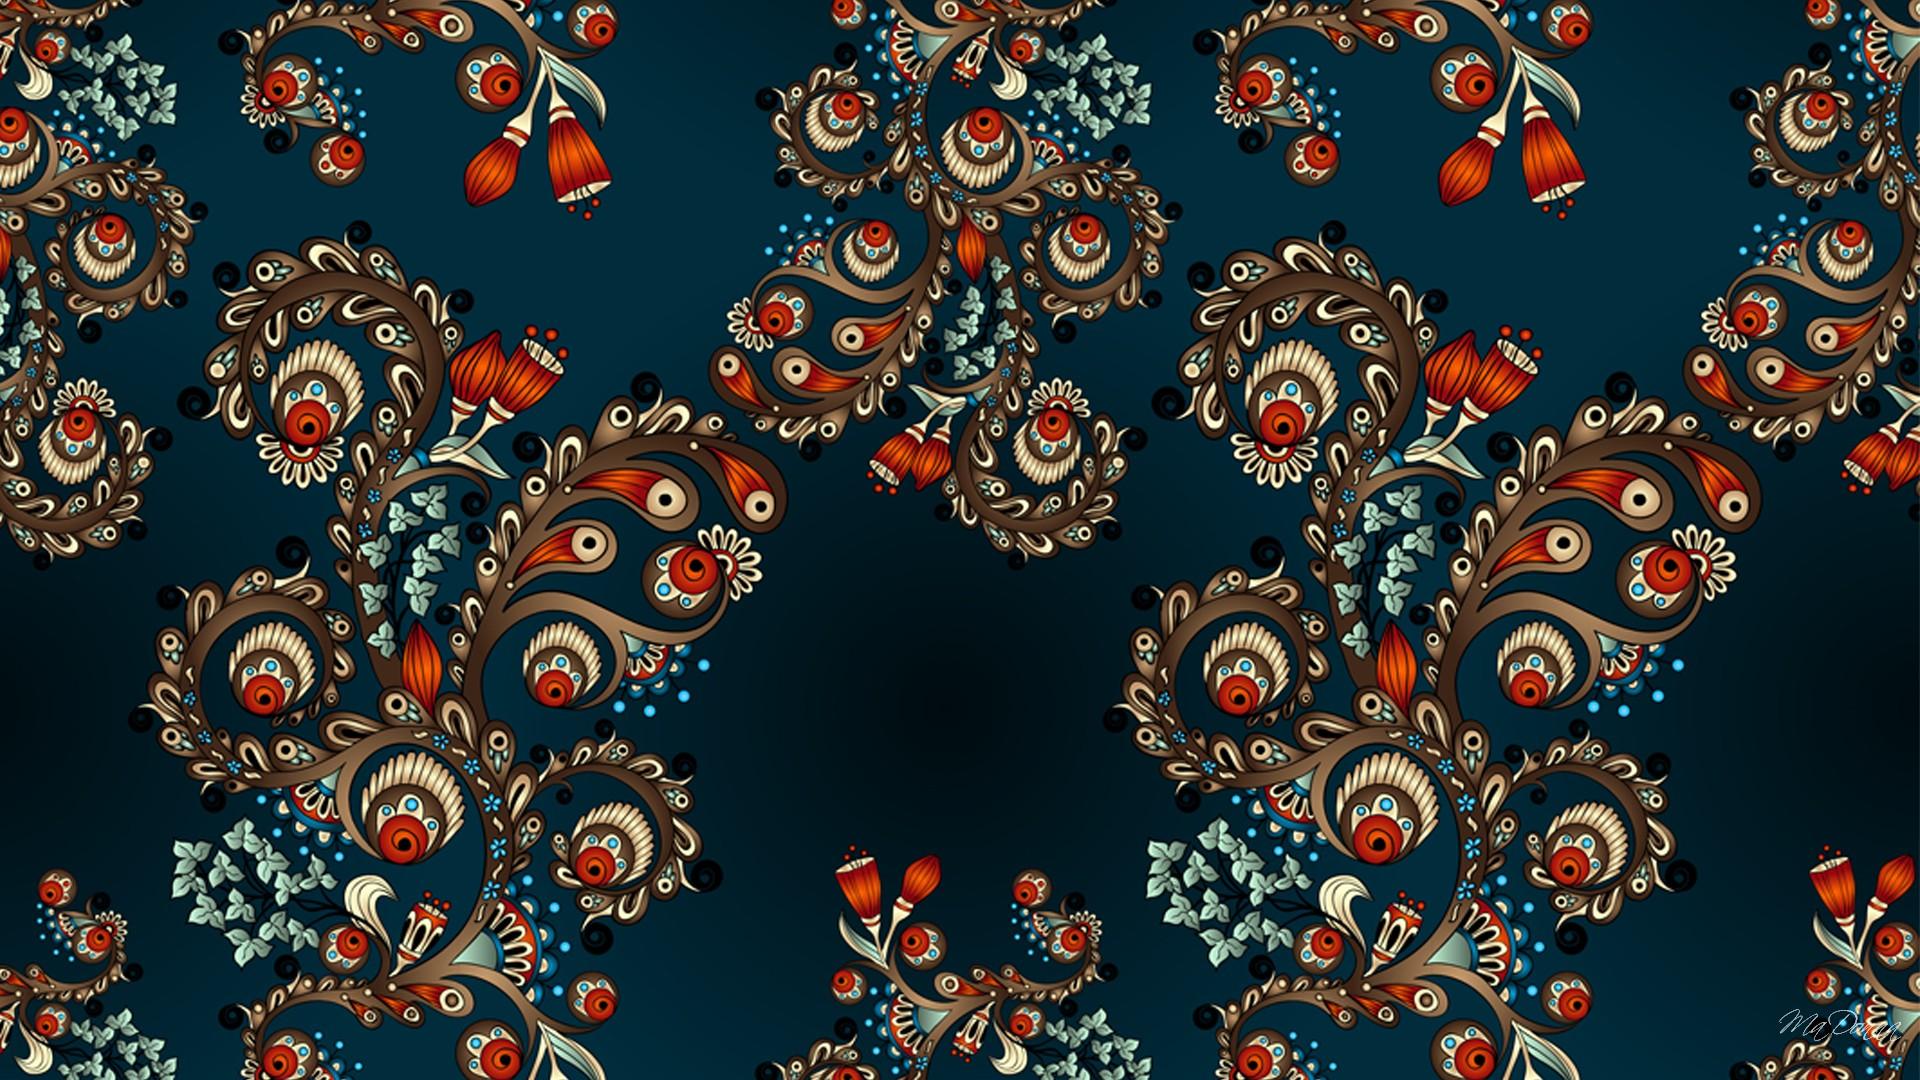 Fall Desktop Wallpaper Mac Paisley Wallpaper 1920x1080 45353